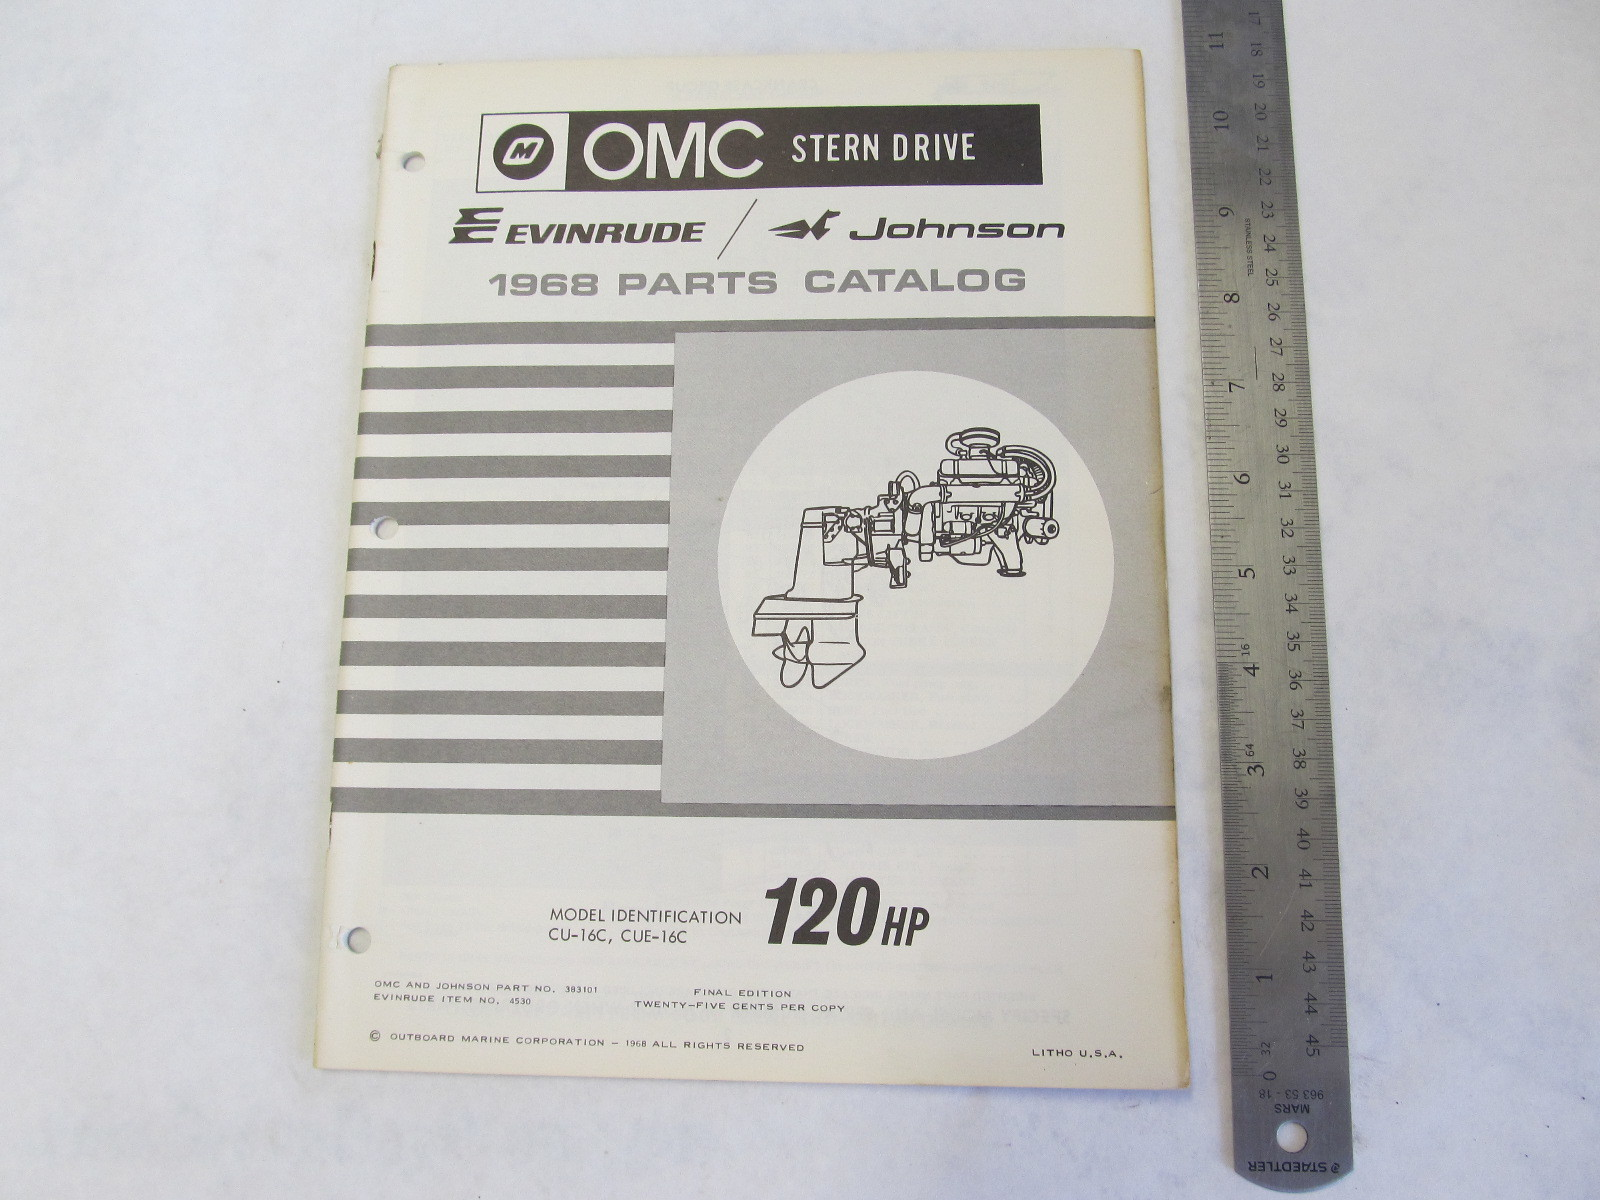 1968 Omc Stern Drive Parts Catalog 120 Hp Cu 16c Cue 16c Green Bay Propeller Marine Llc